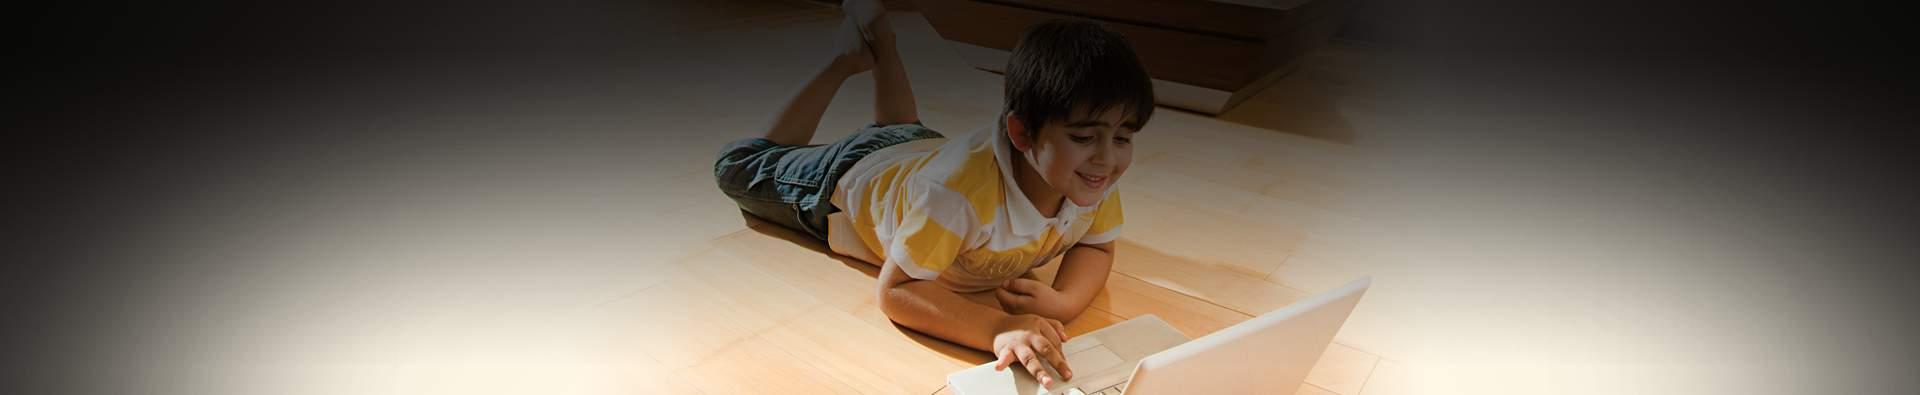 Secure Education Plan - Child Education   Jubilee Life